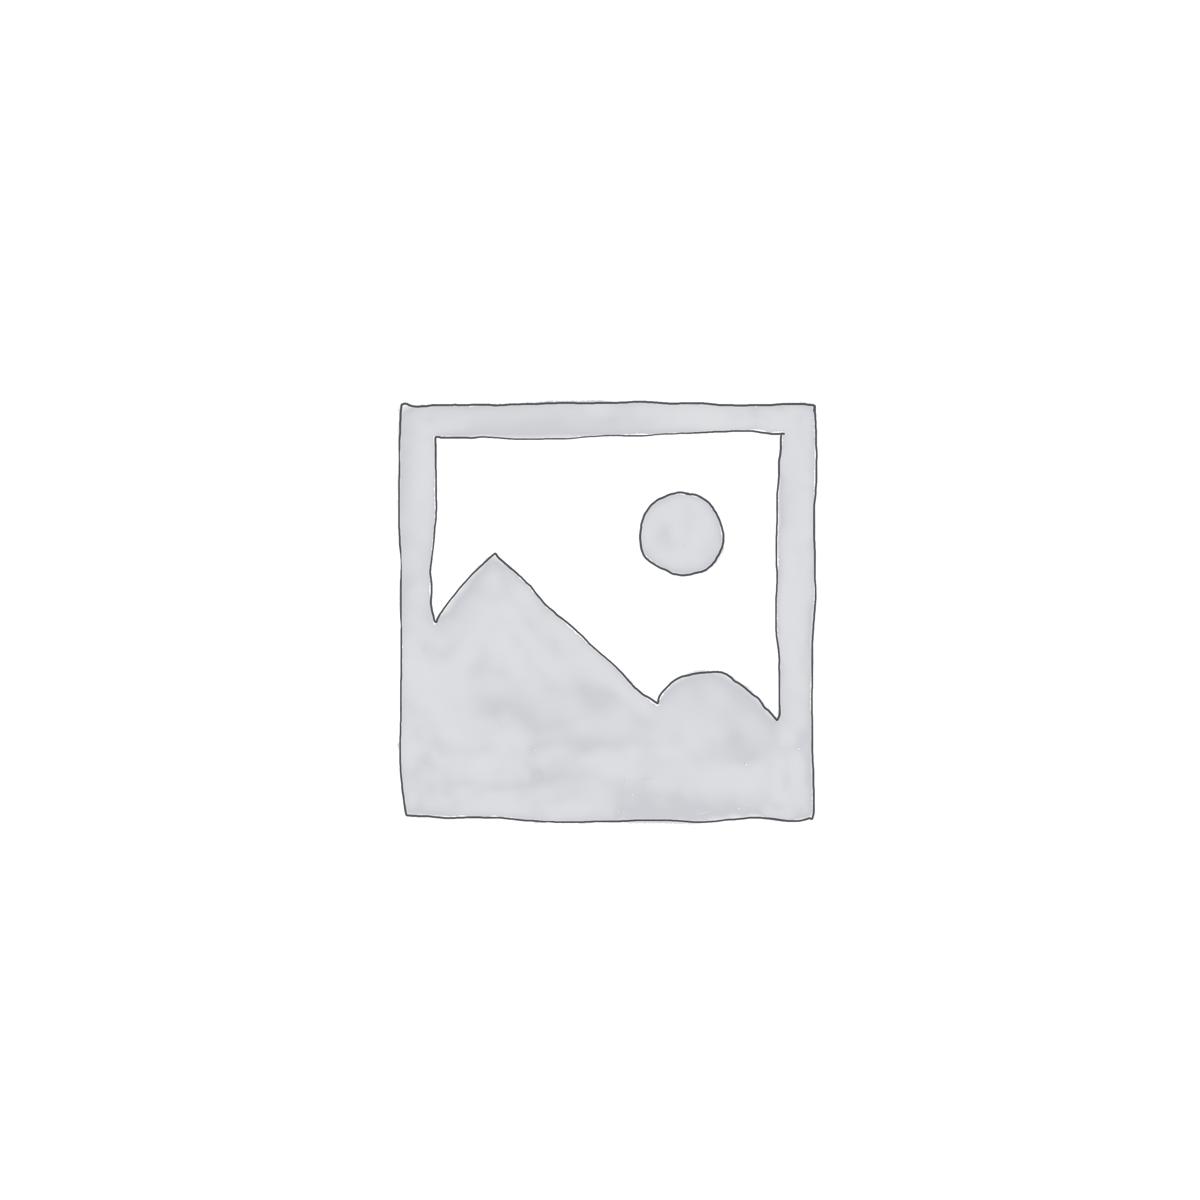 Colorful Gingko Leaf Pattern Wall Mural